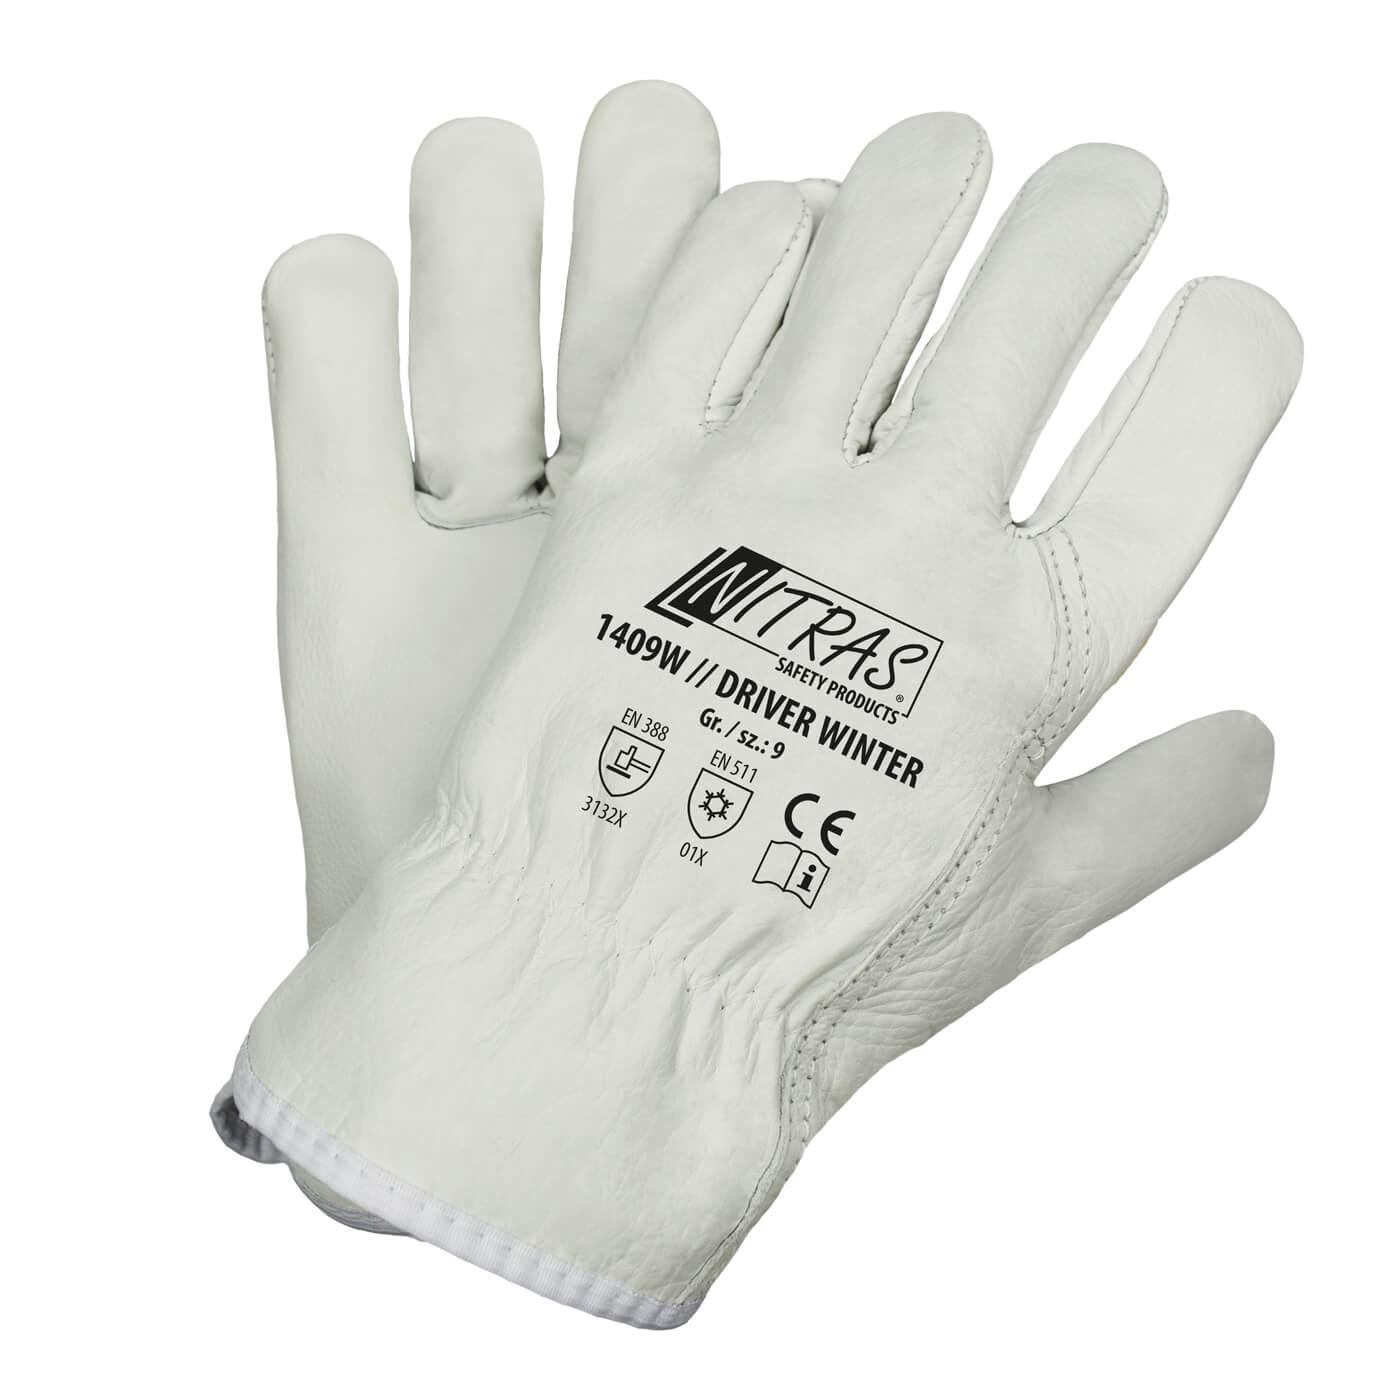 Rękawice skórzane Nitras 1409/ DRIVER WINTER